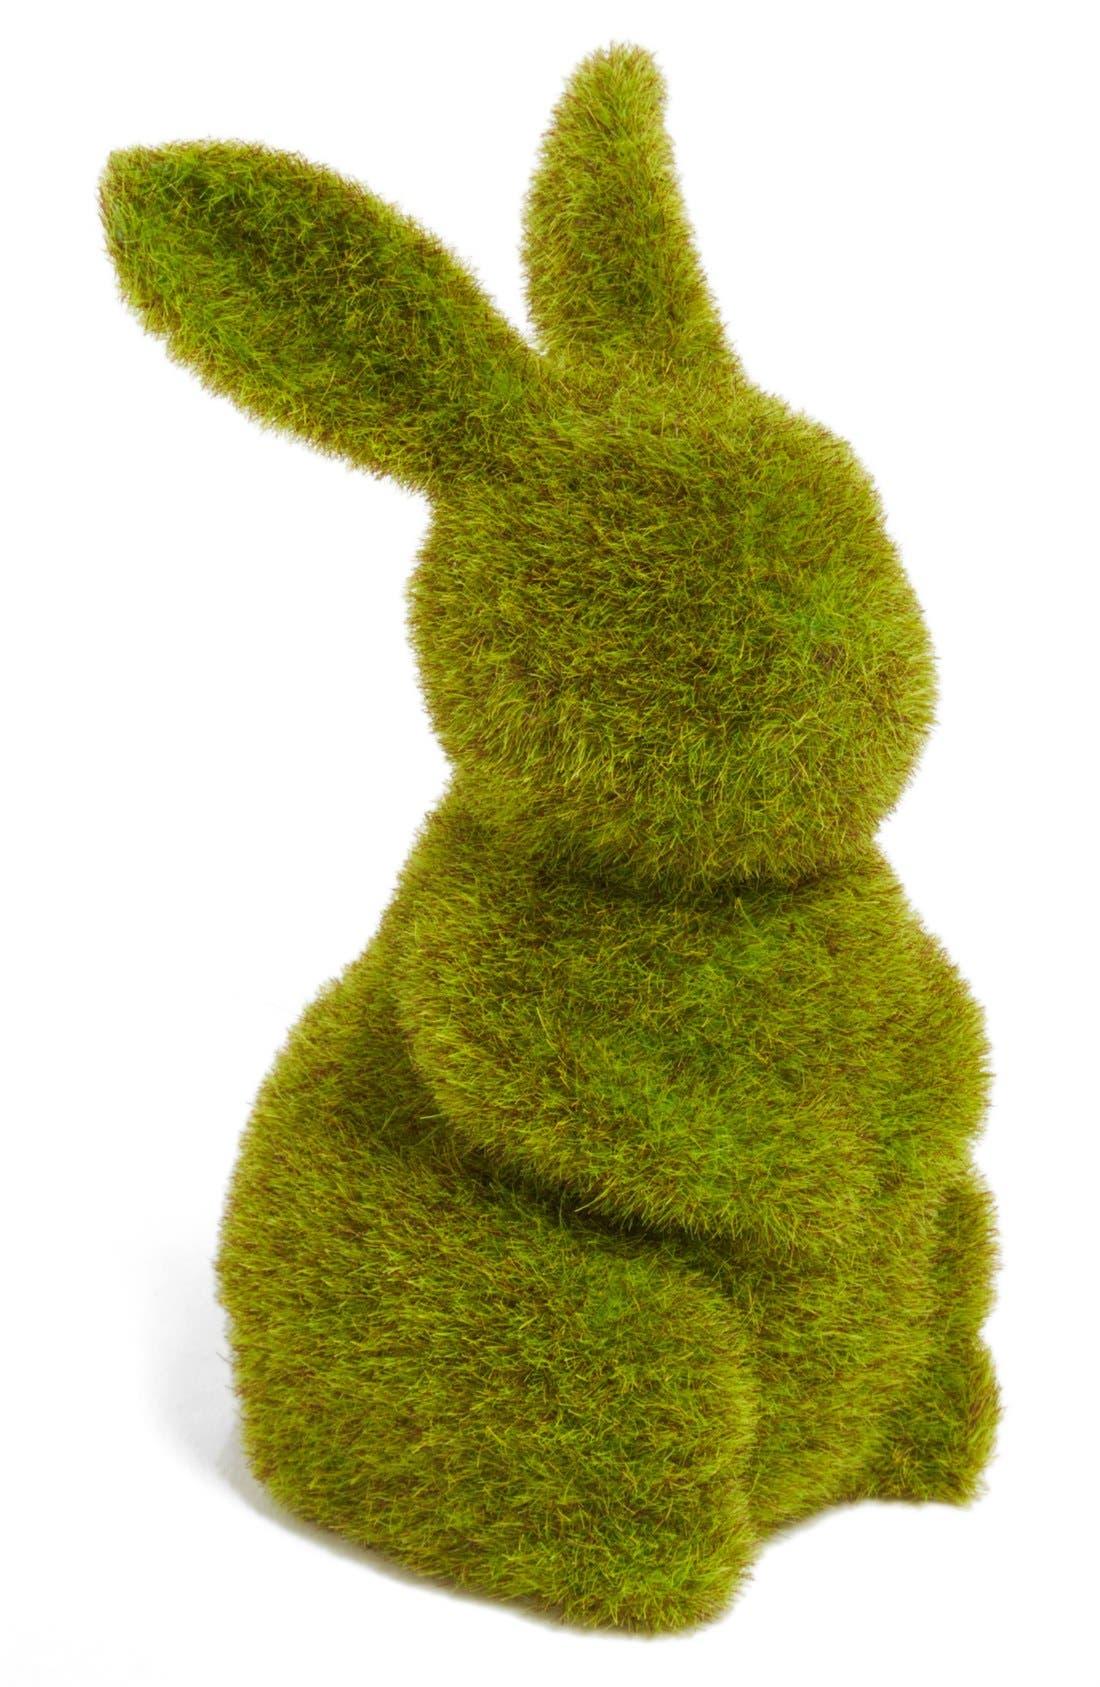 Alternate Image 1 Selected - ALLSTATE 'Moss Bunny' Figurine